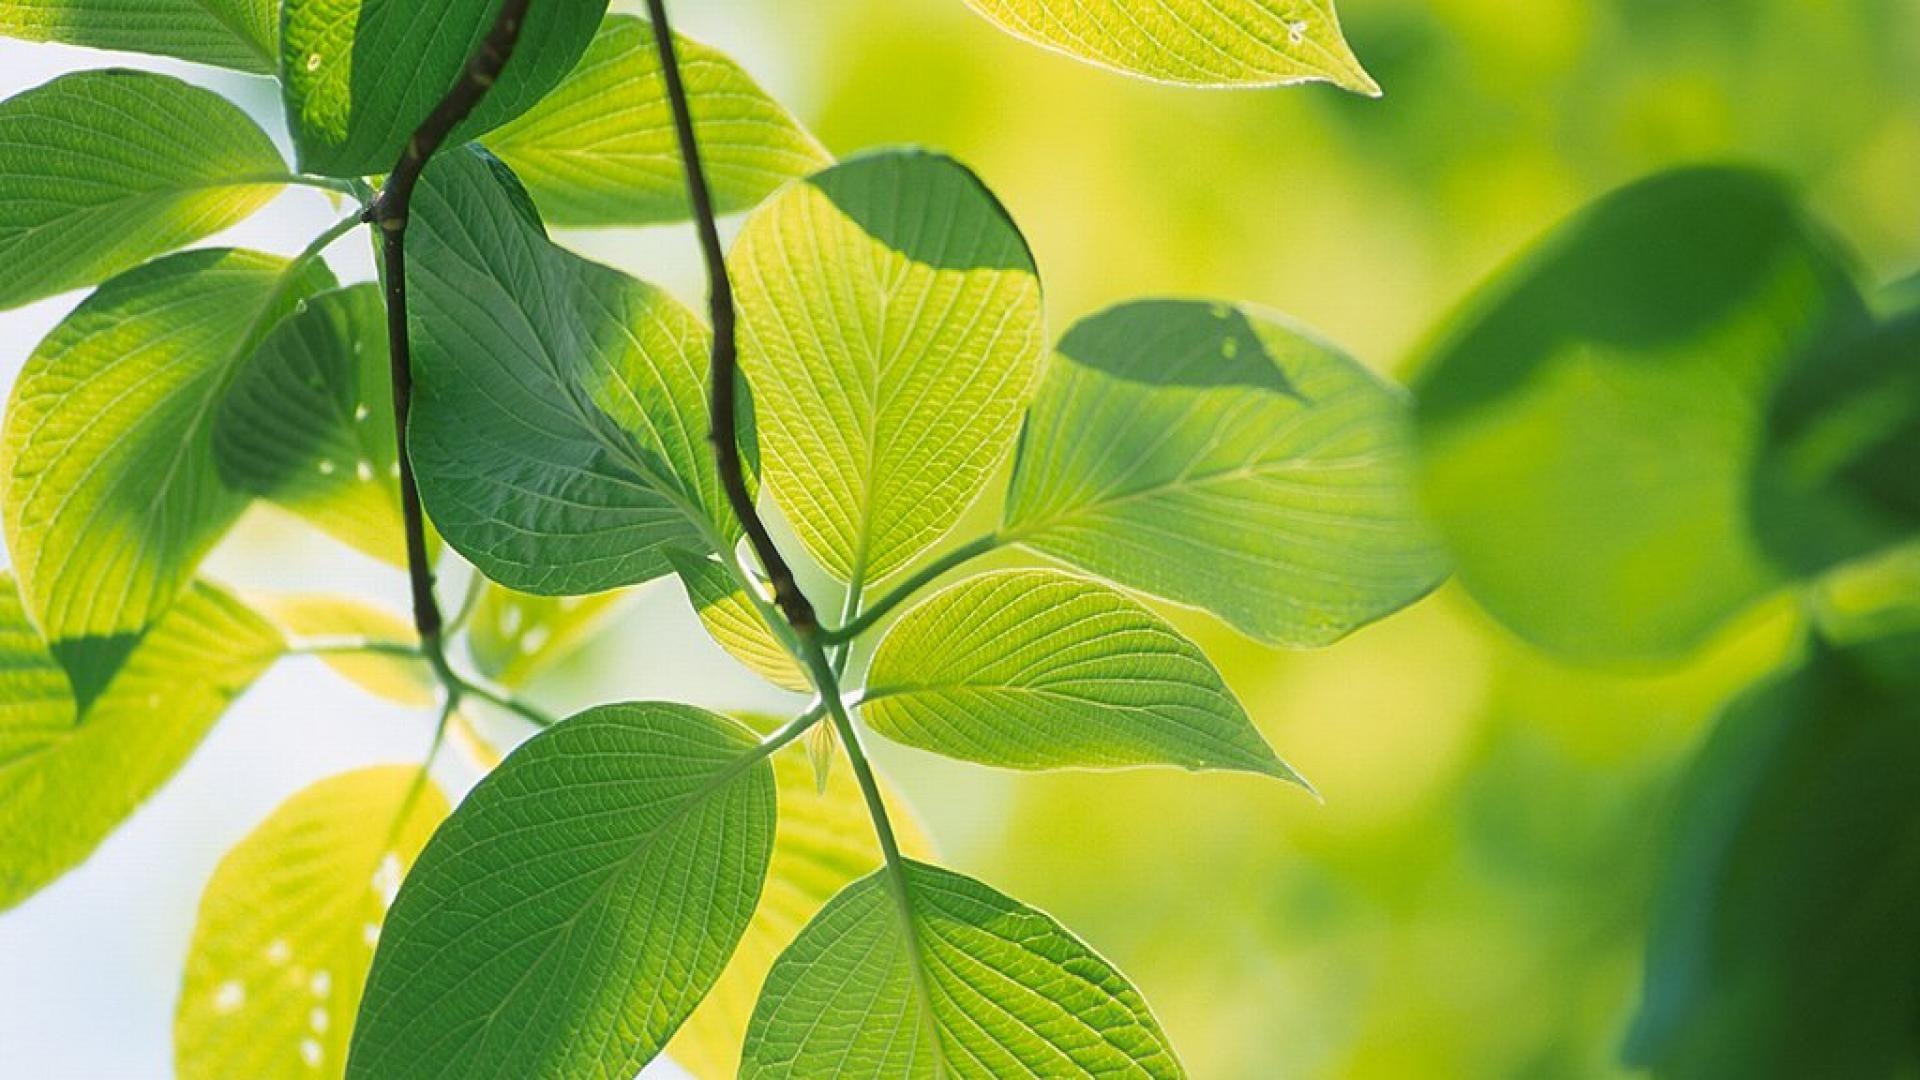 Green Leaves wallpaper wallpaper free download × Leave